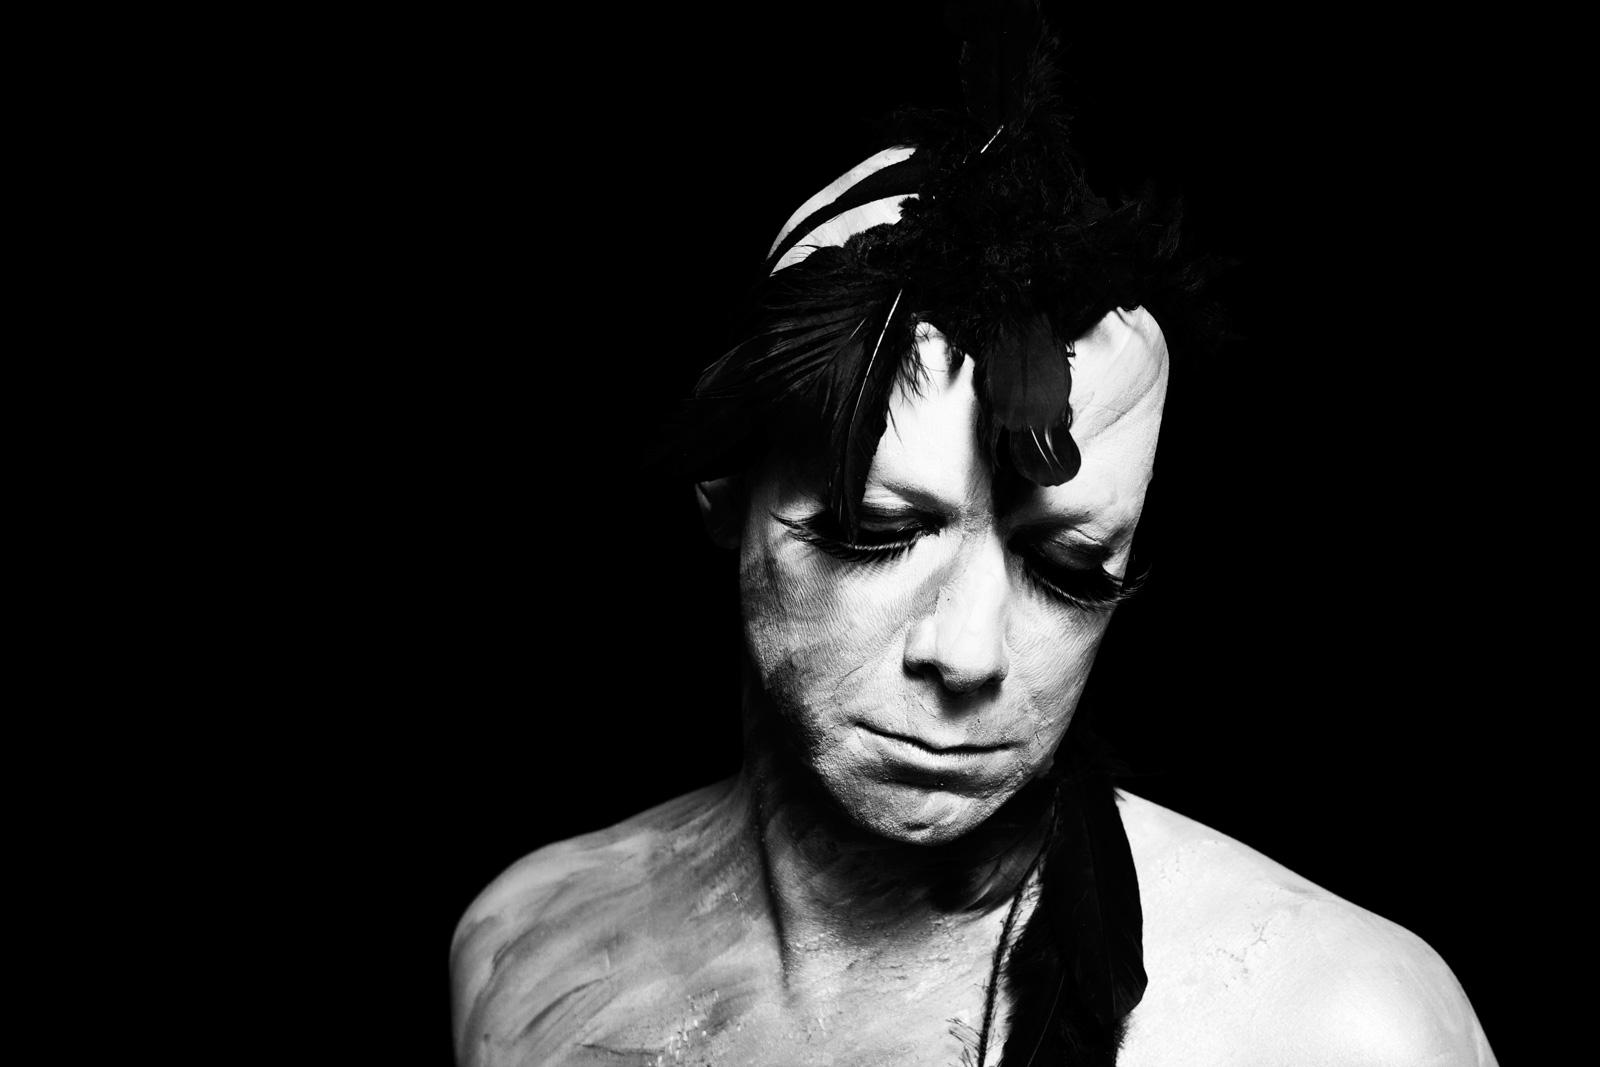 nr 2-Luminous-black and white photo-Michael